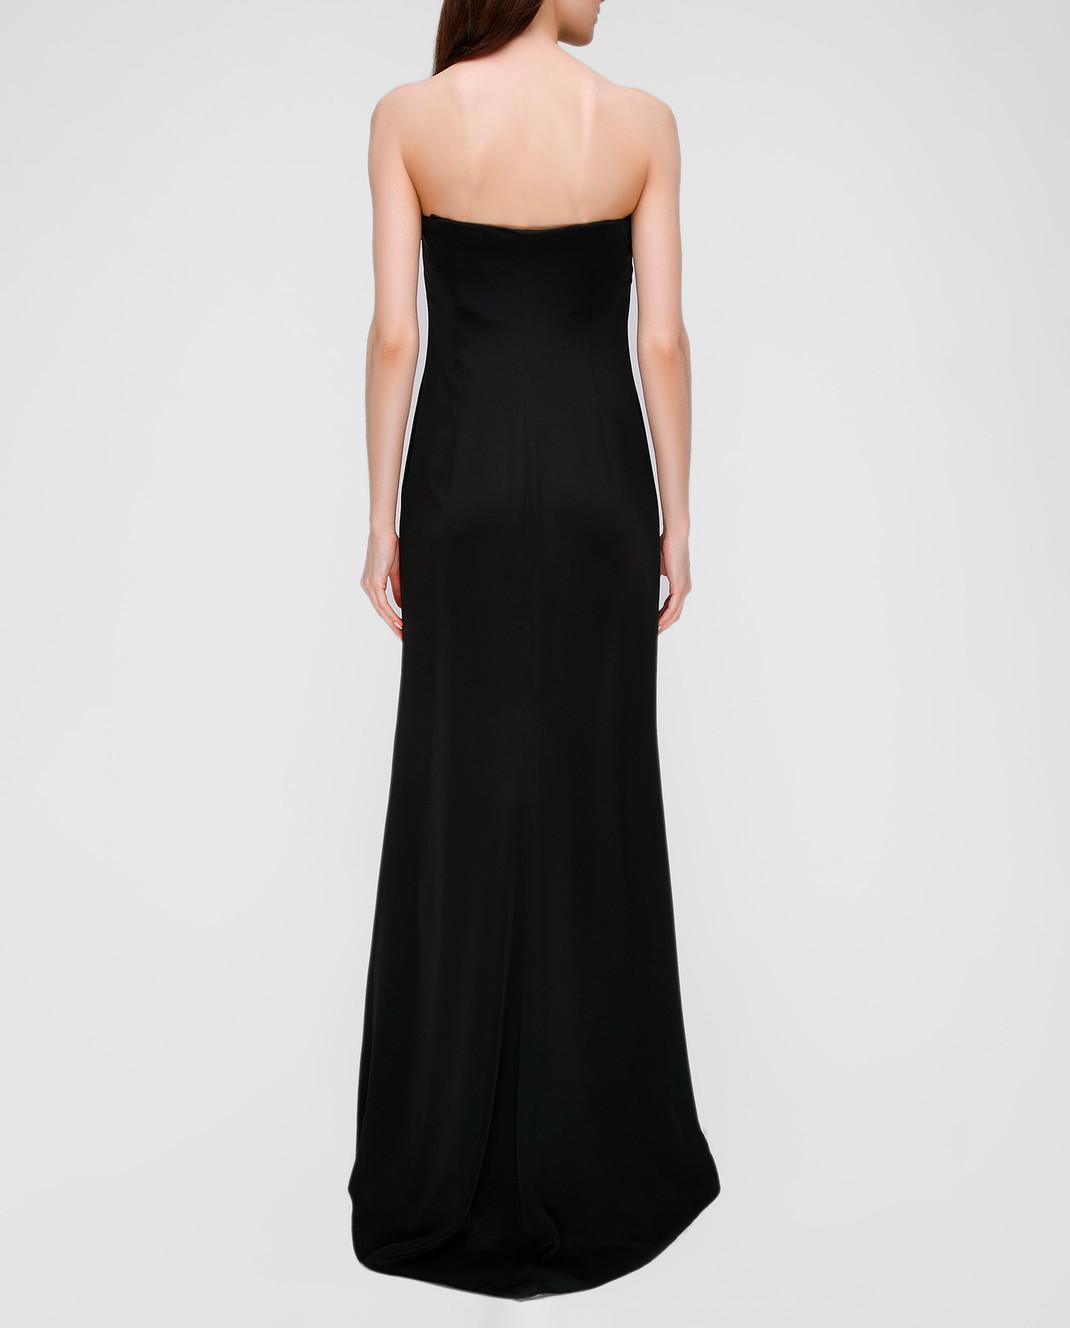 Valentino Черное платье из шелка B0AB3S0 изображение 4